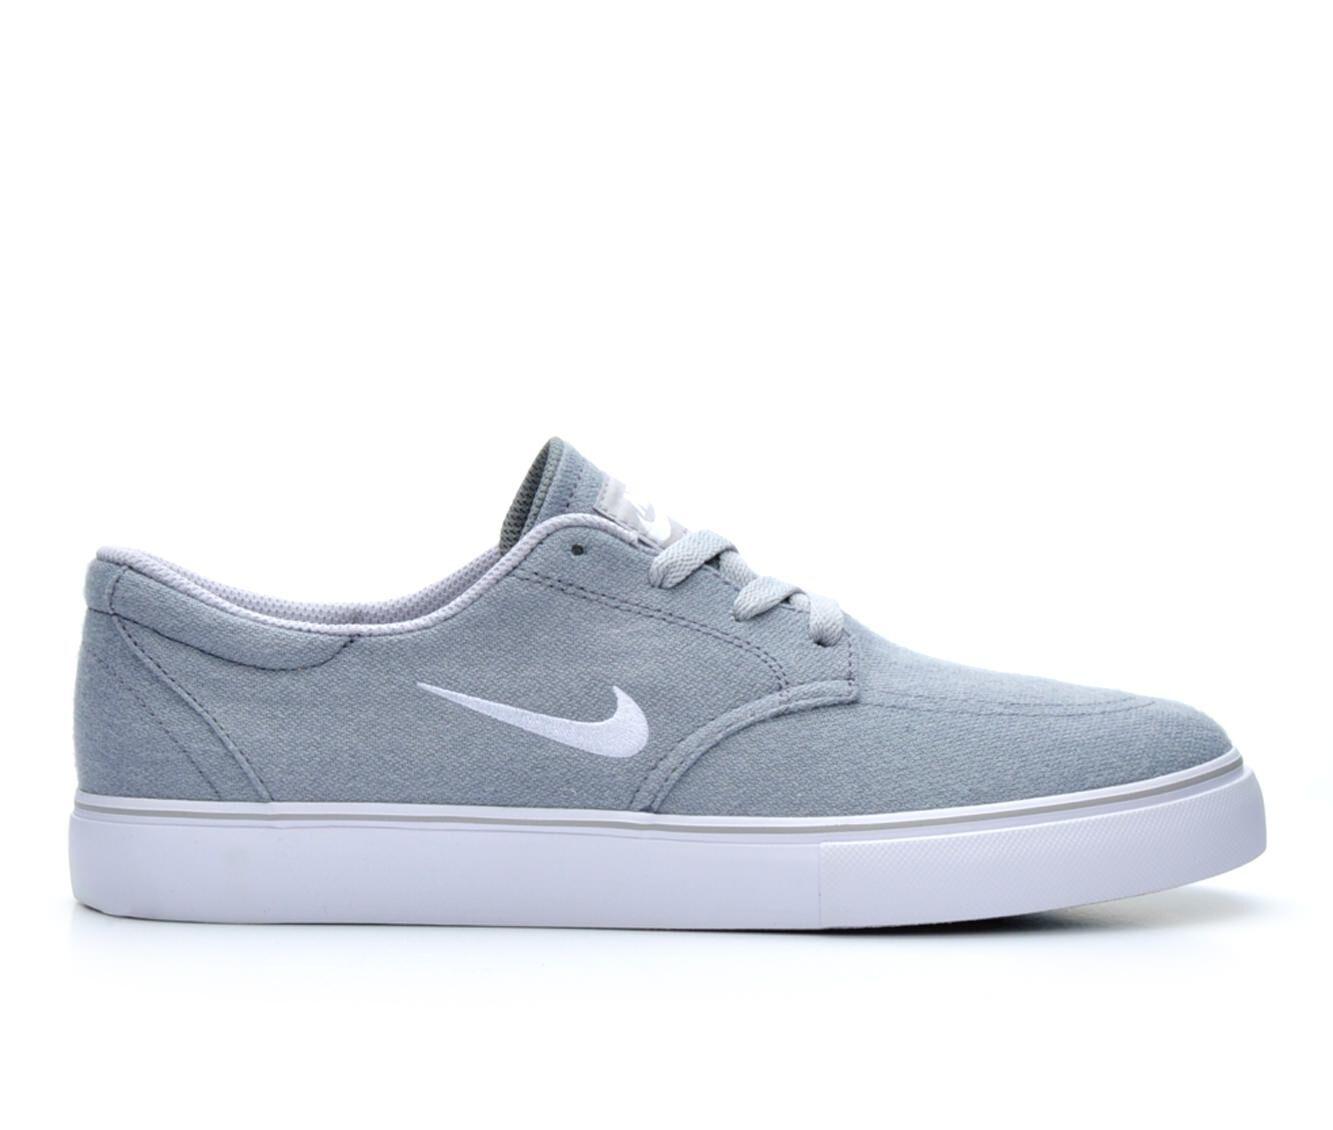 Images Mens Nike SB Clutch Premium Skate Shoes